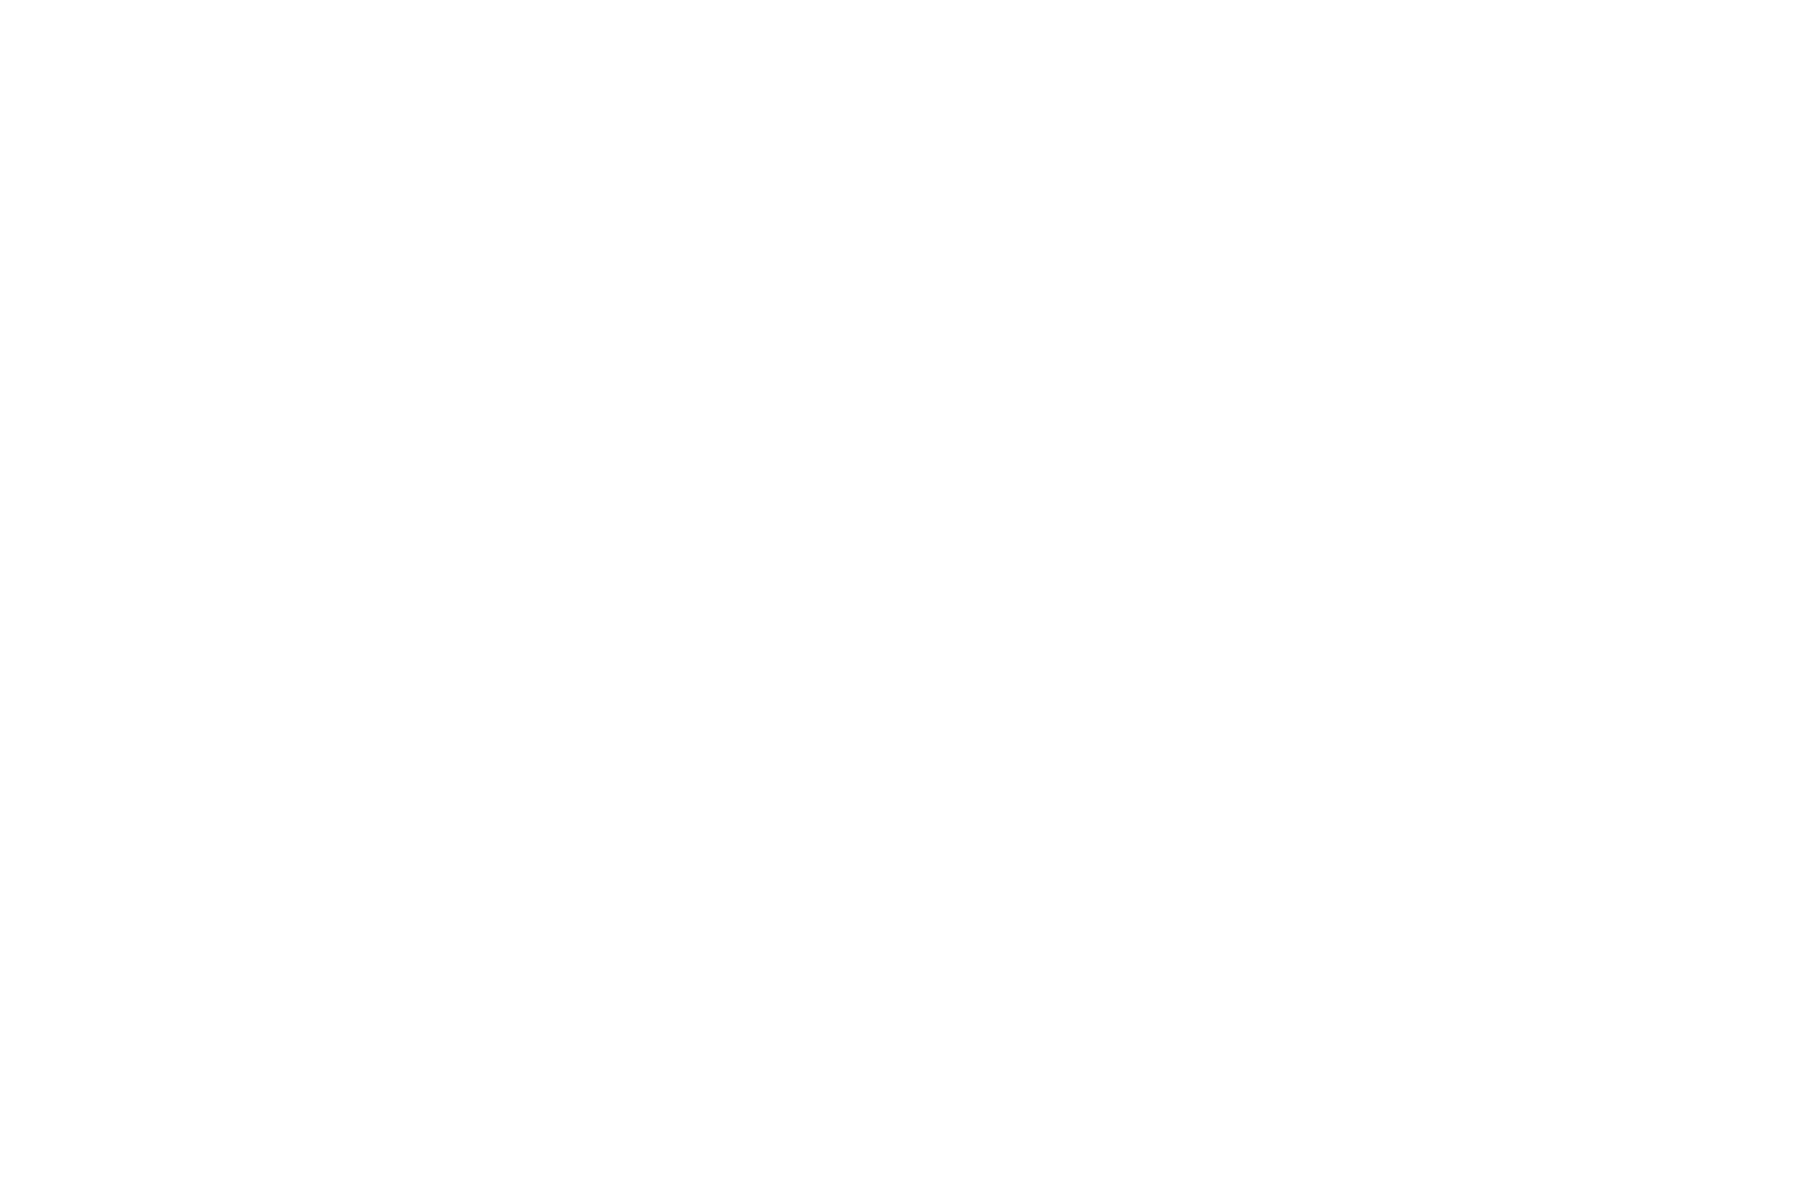 cadance.png